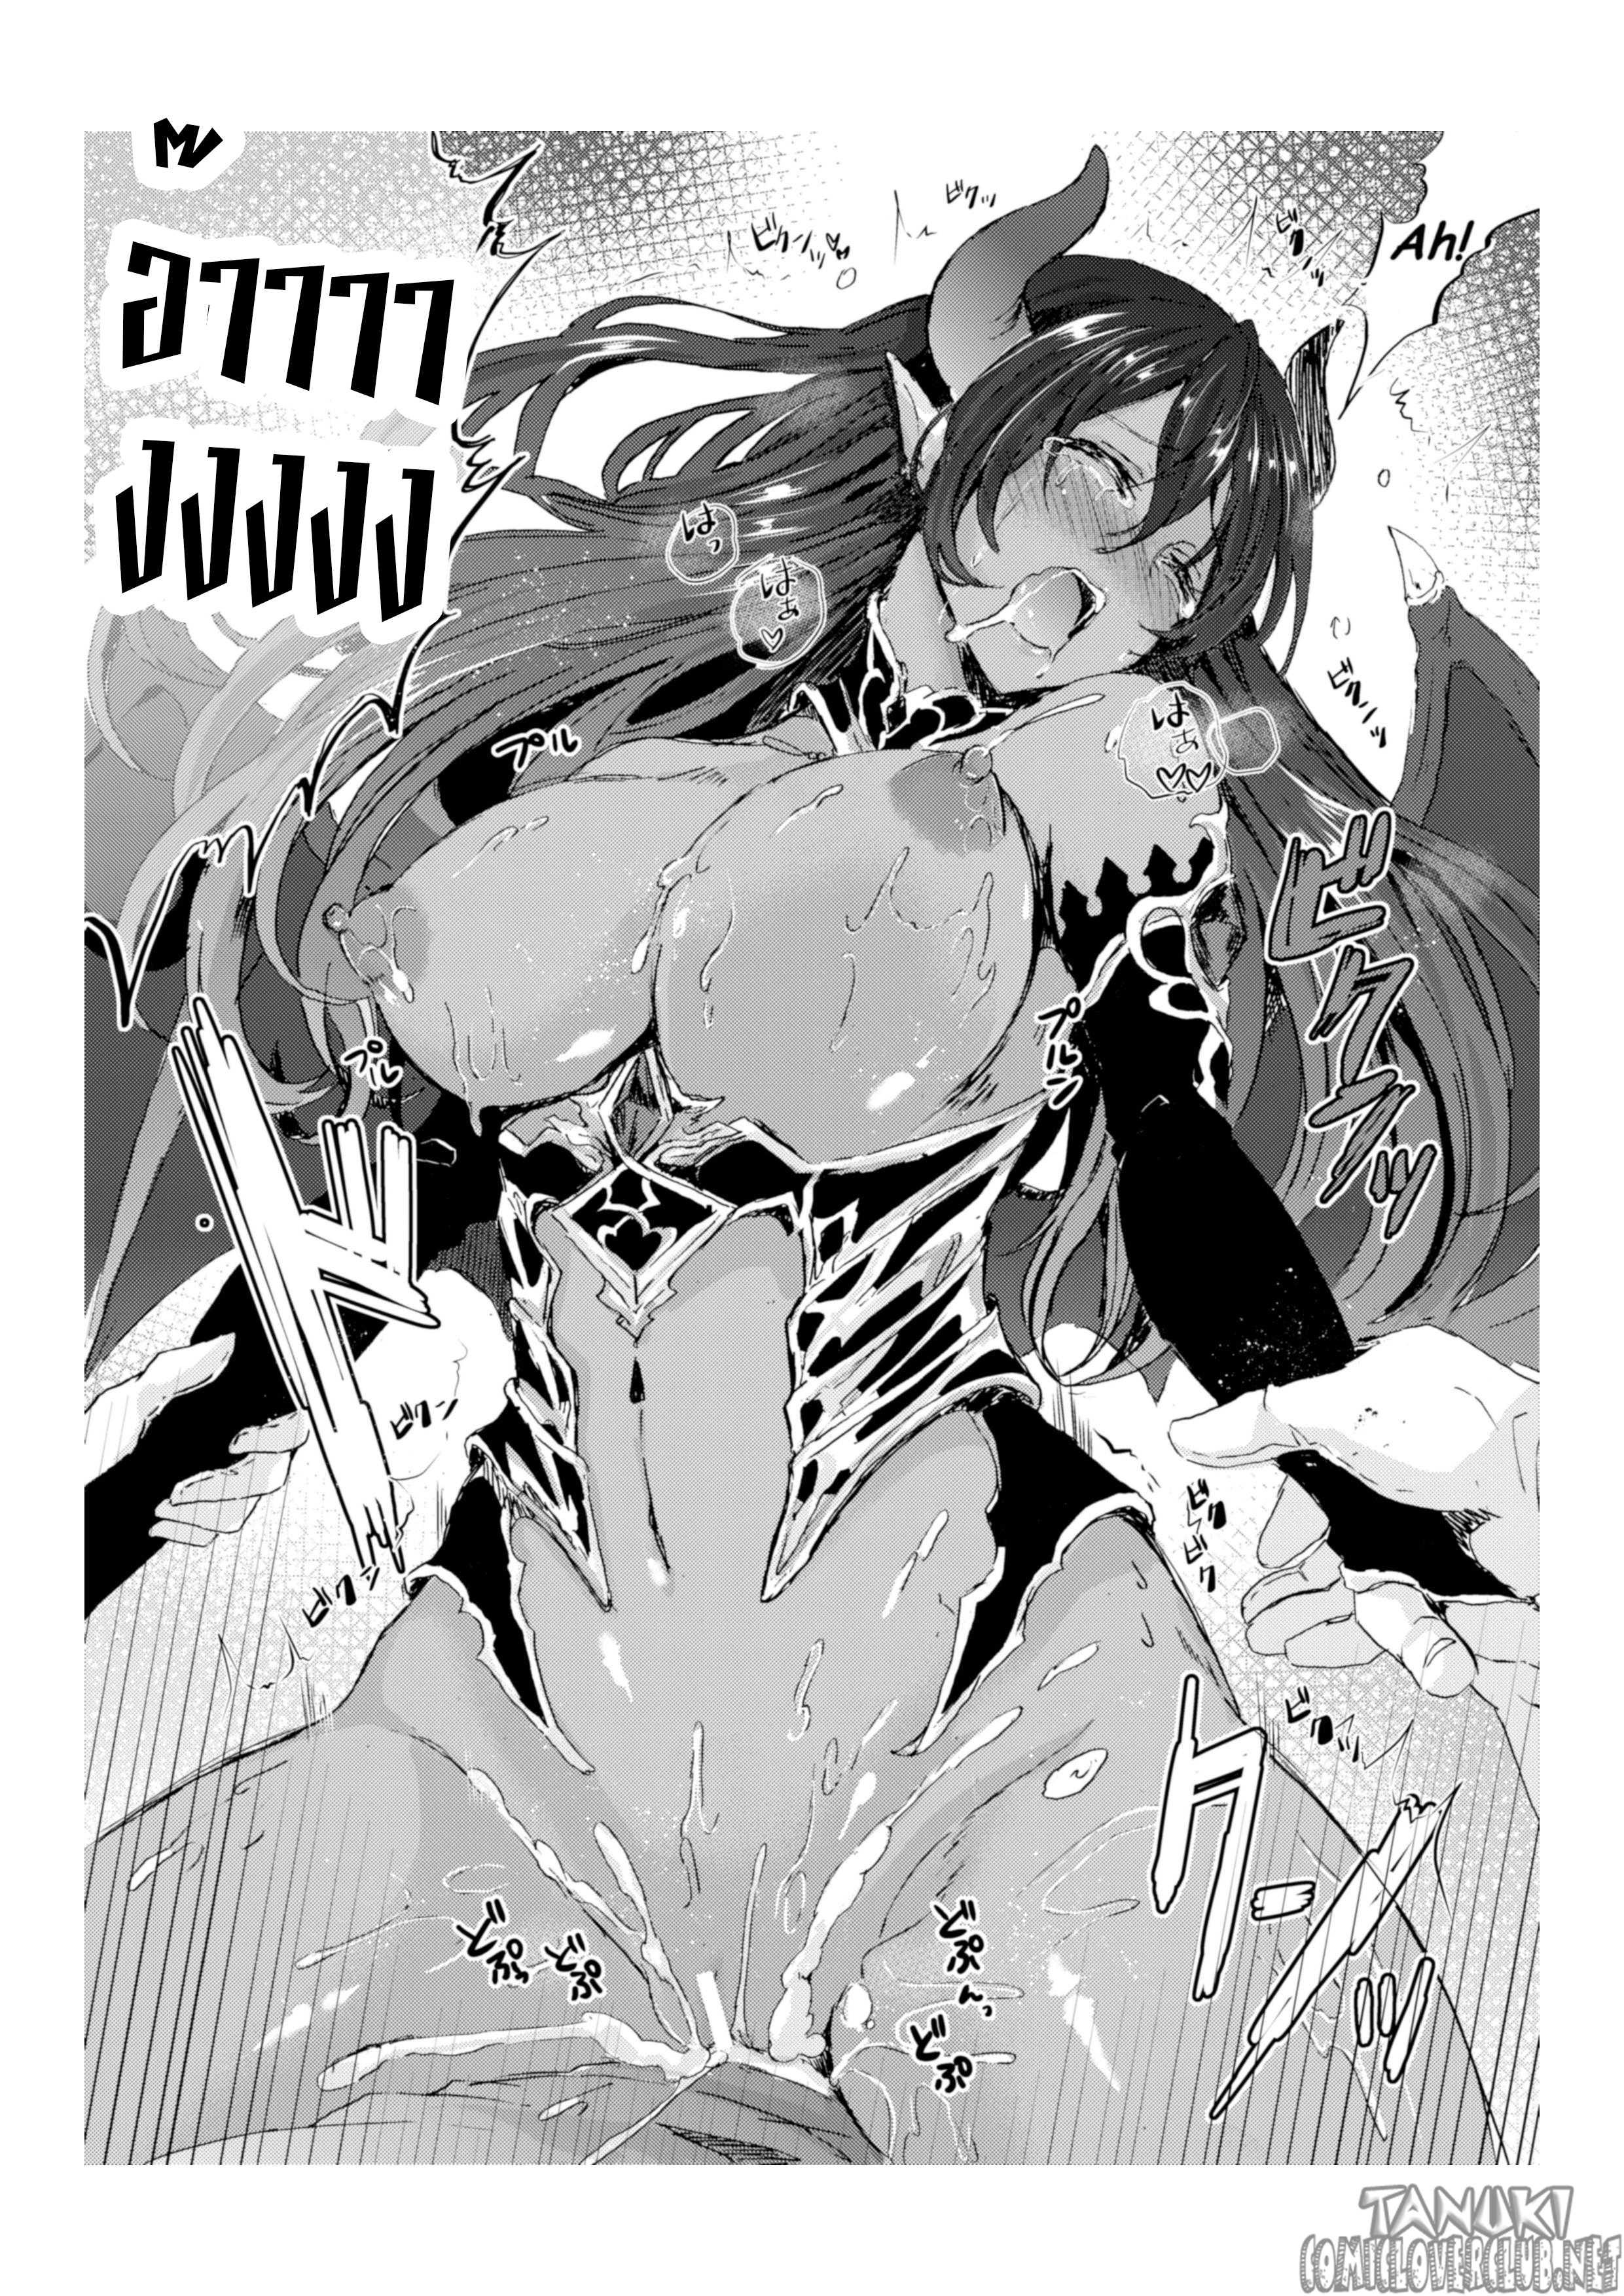 aji-pontarou-the-demon-king-and-his-bride